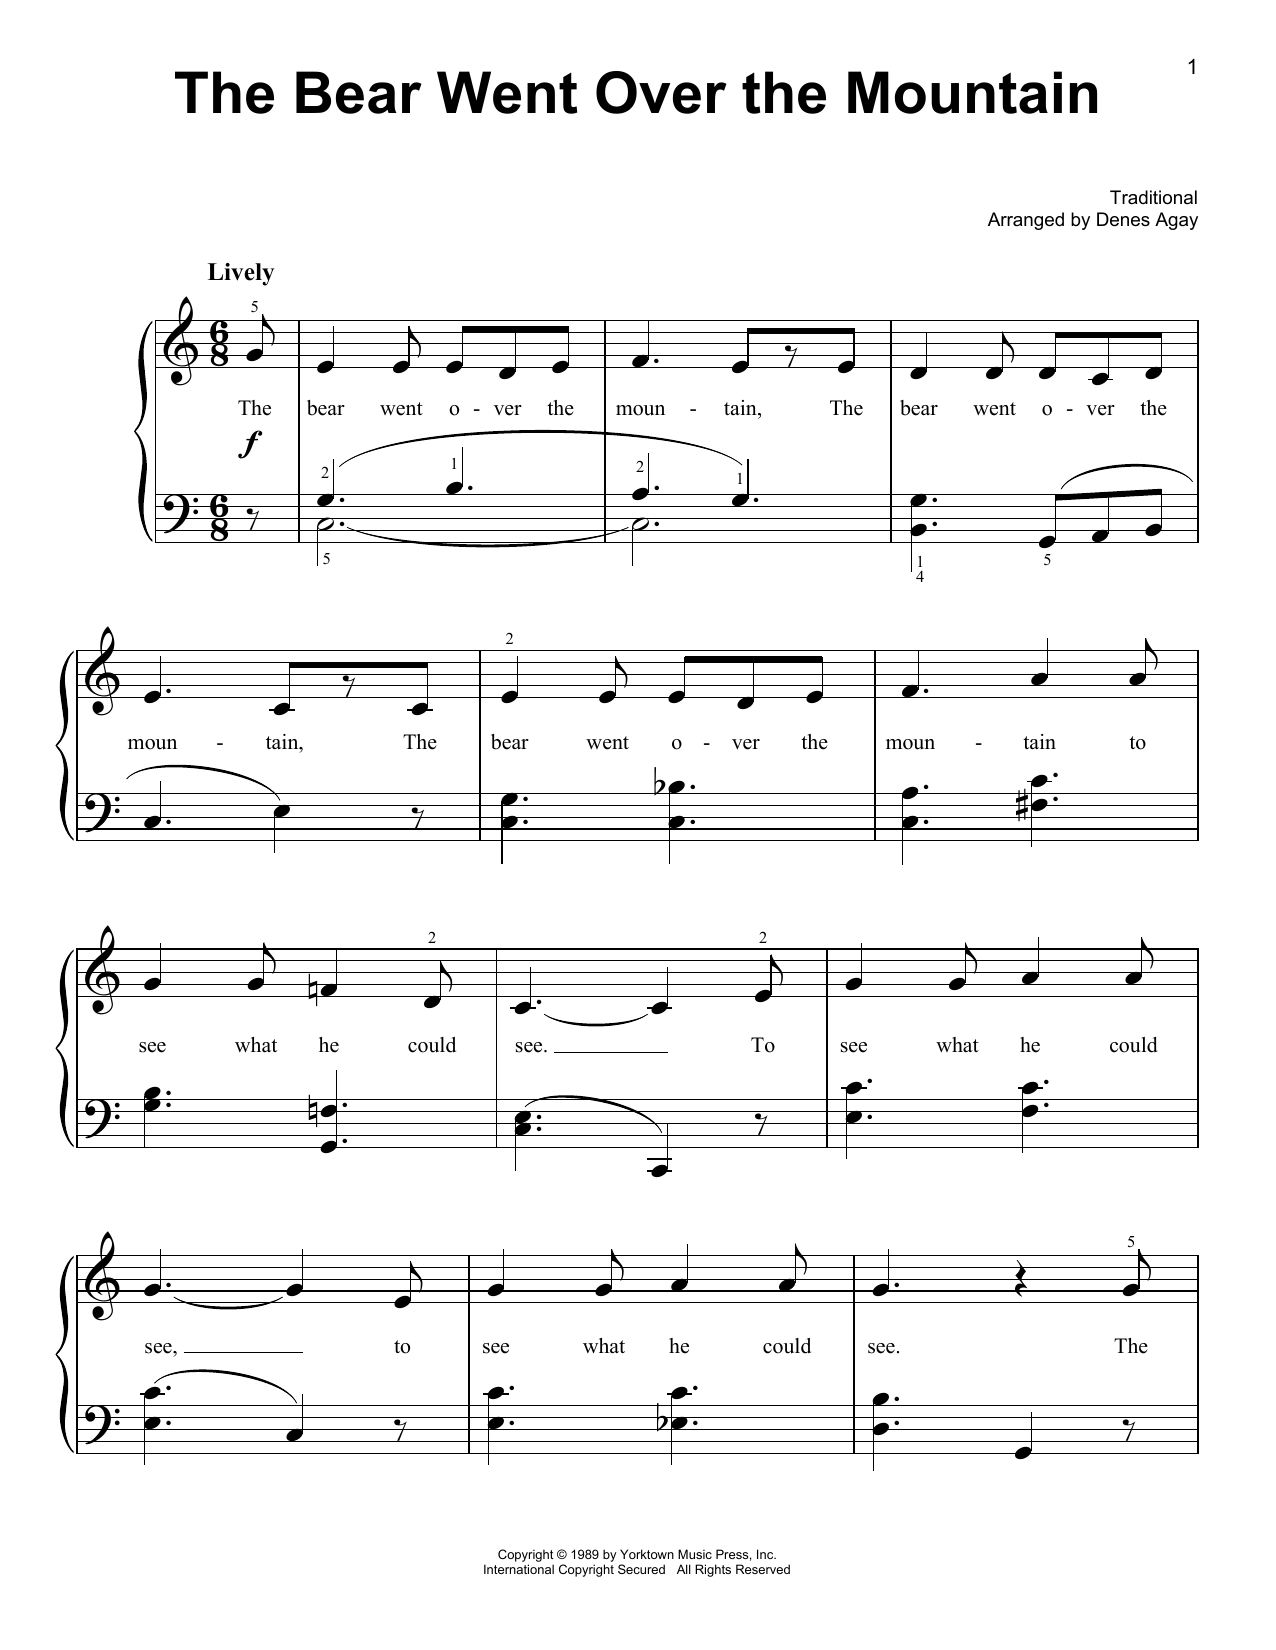 The Bear Went Over The Mountain (arr. Denes Agay) (Easy Piano)